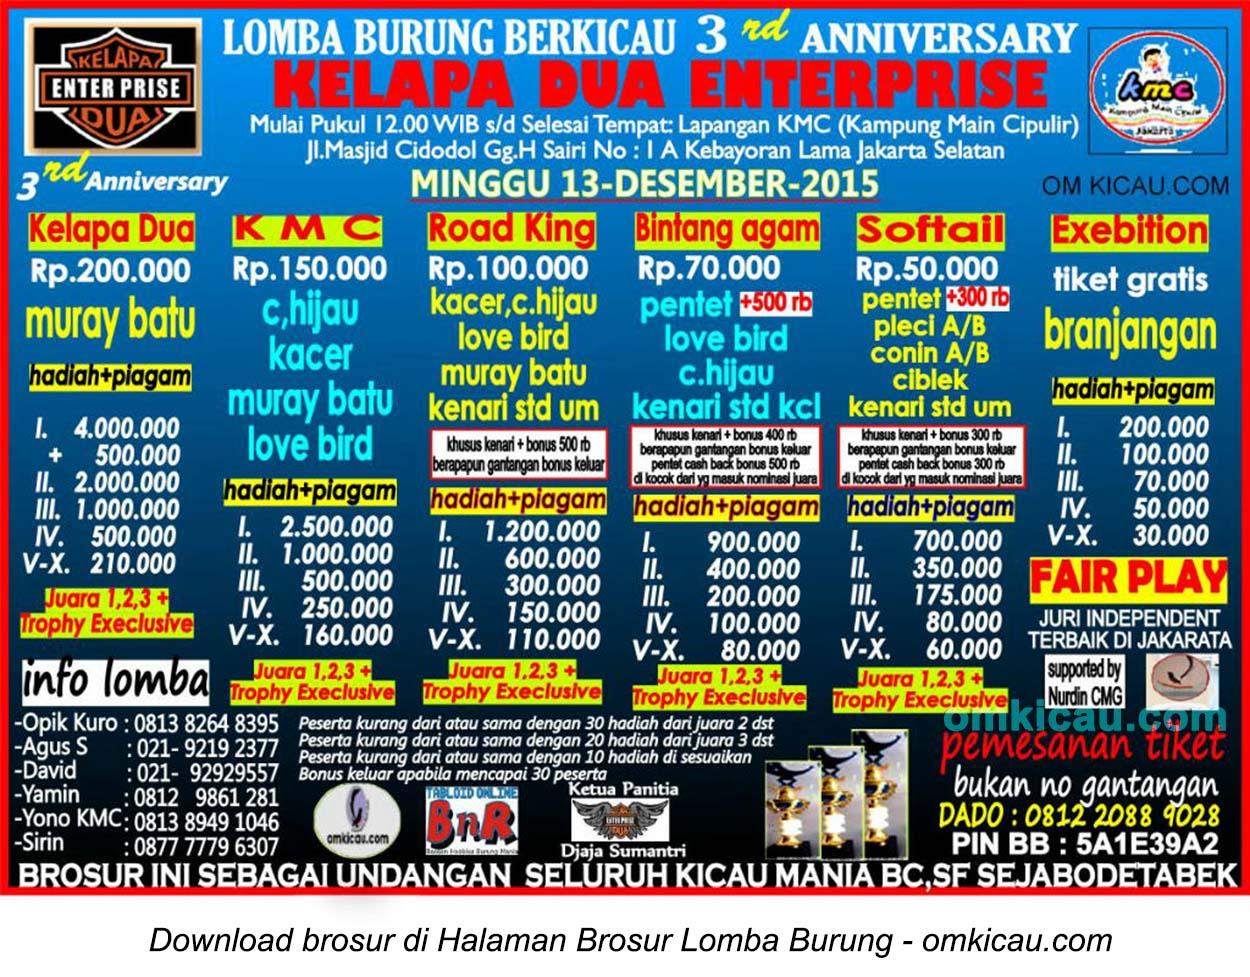 Brosur Lomba Burung Berkicau 3rd Anniversary Kelapa Dua Enterprise, Jakarta Selatan, 13 Desember 2015